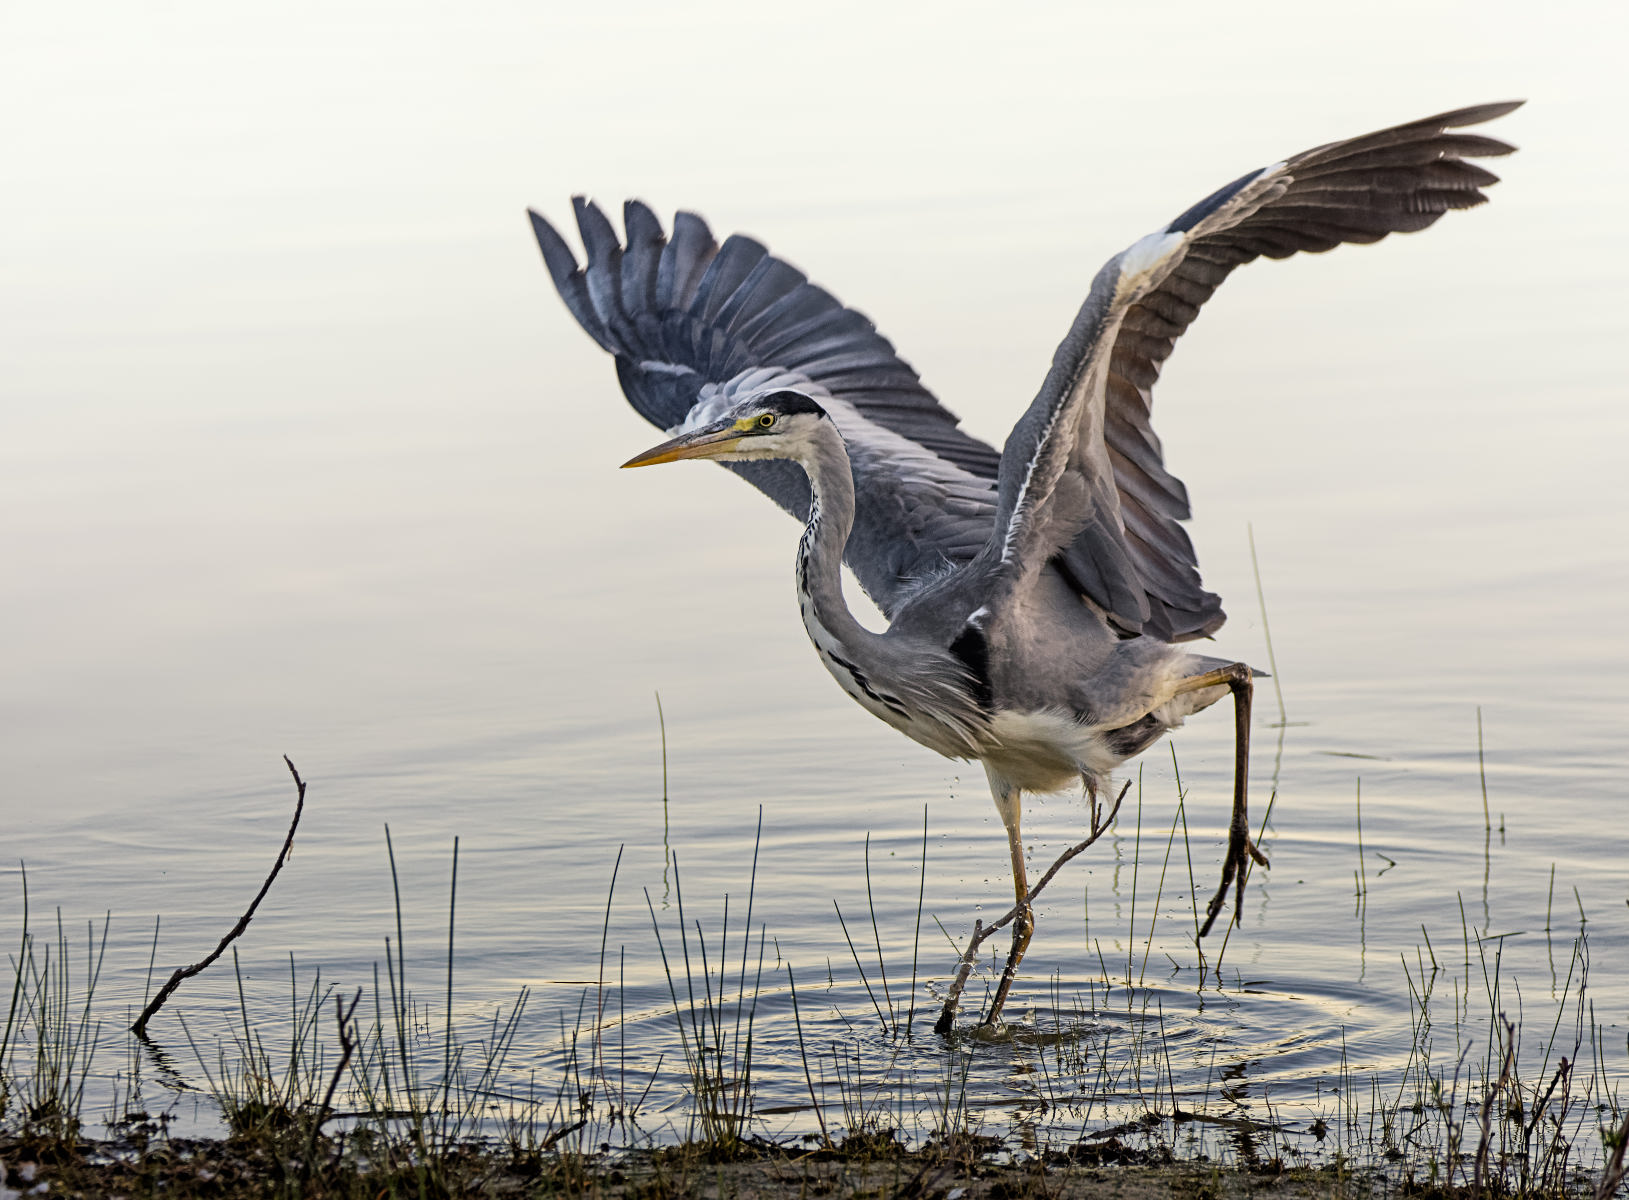 grey heron landing awkwardly amid stalks